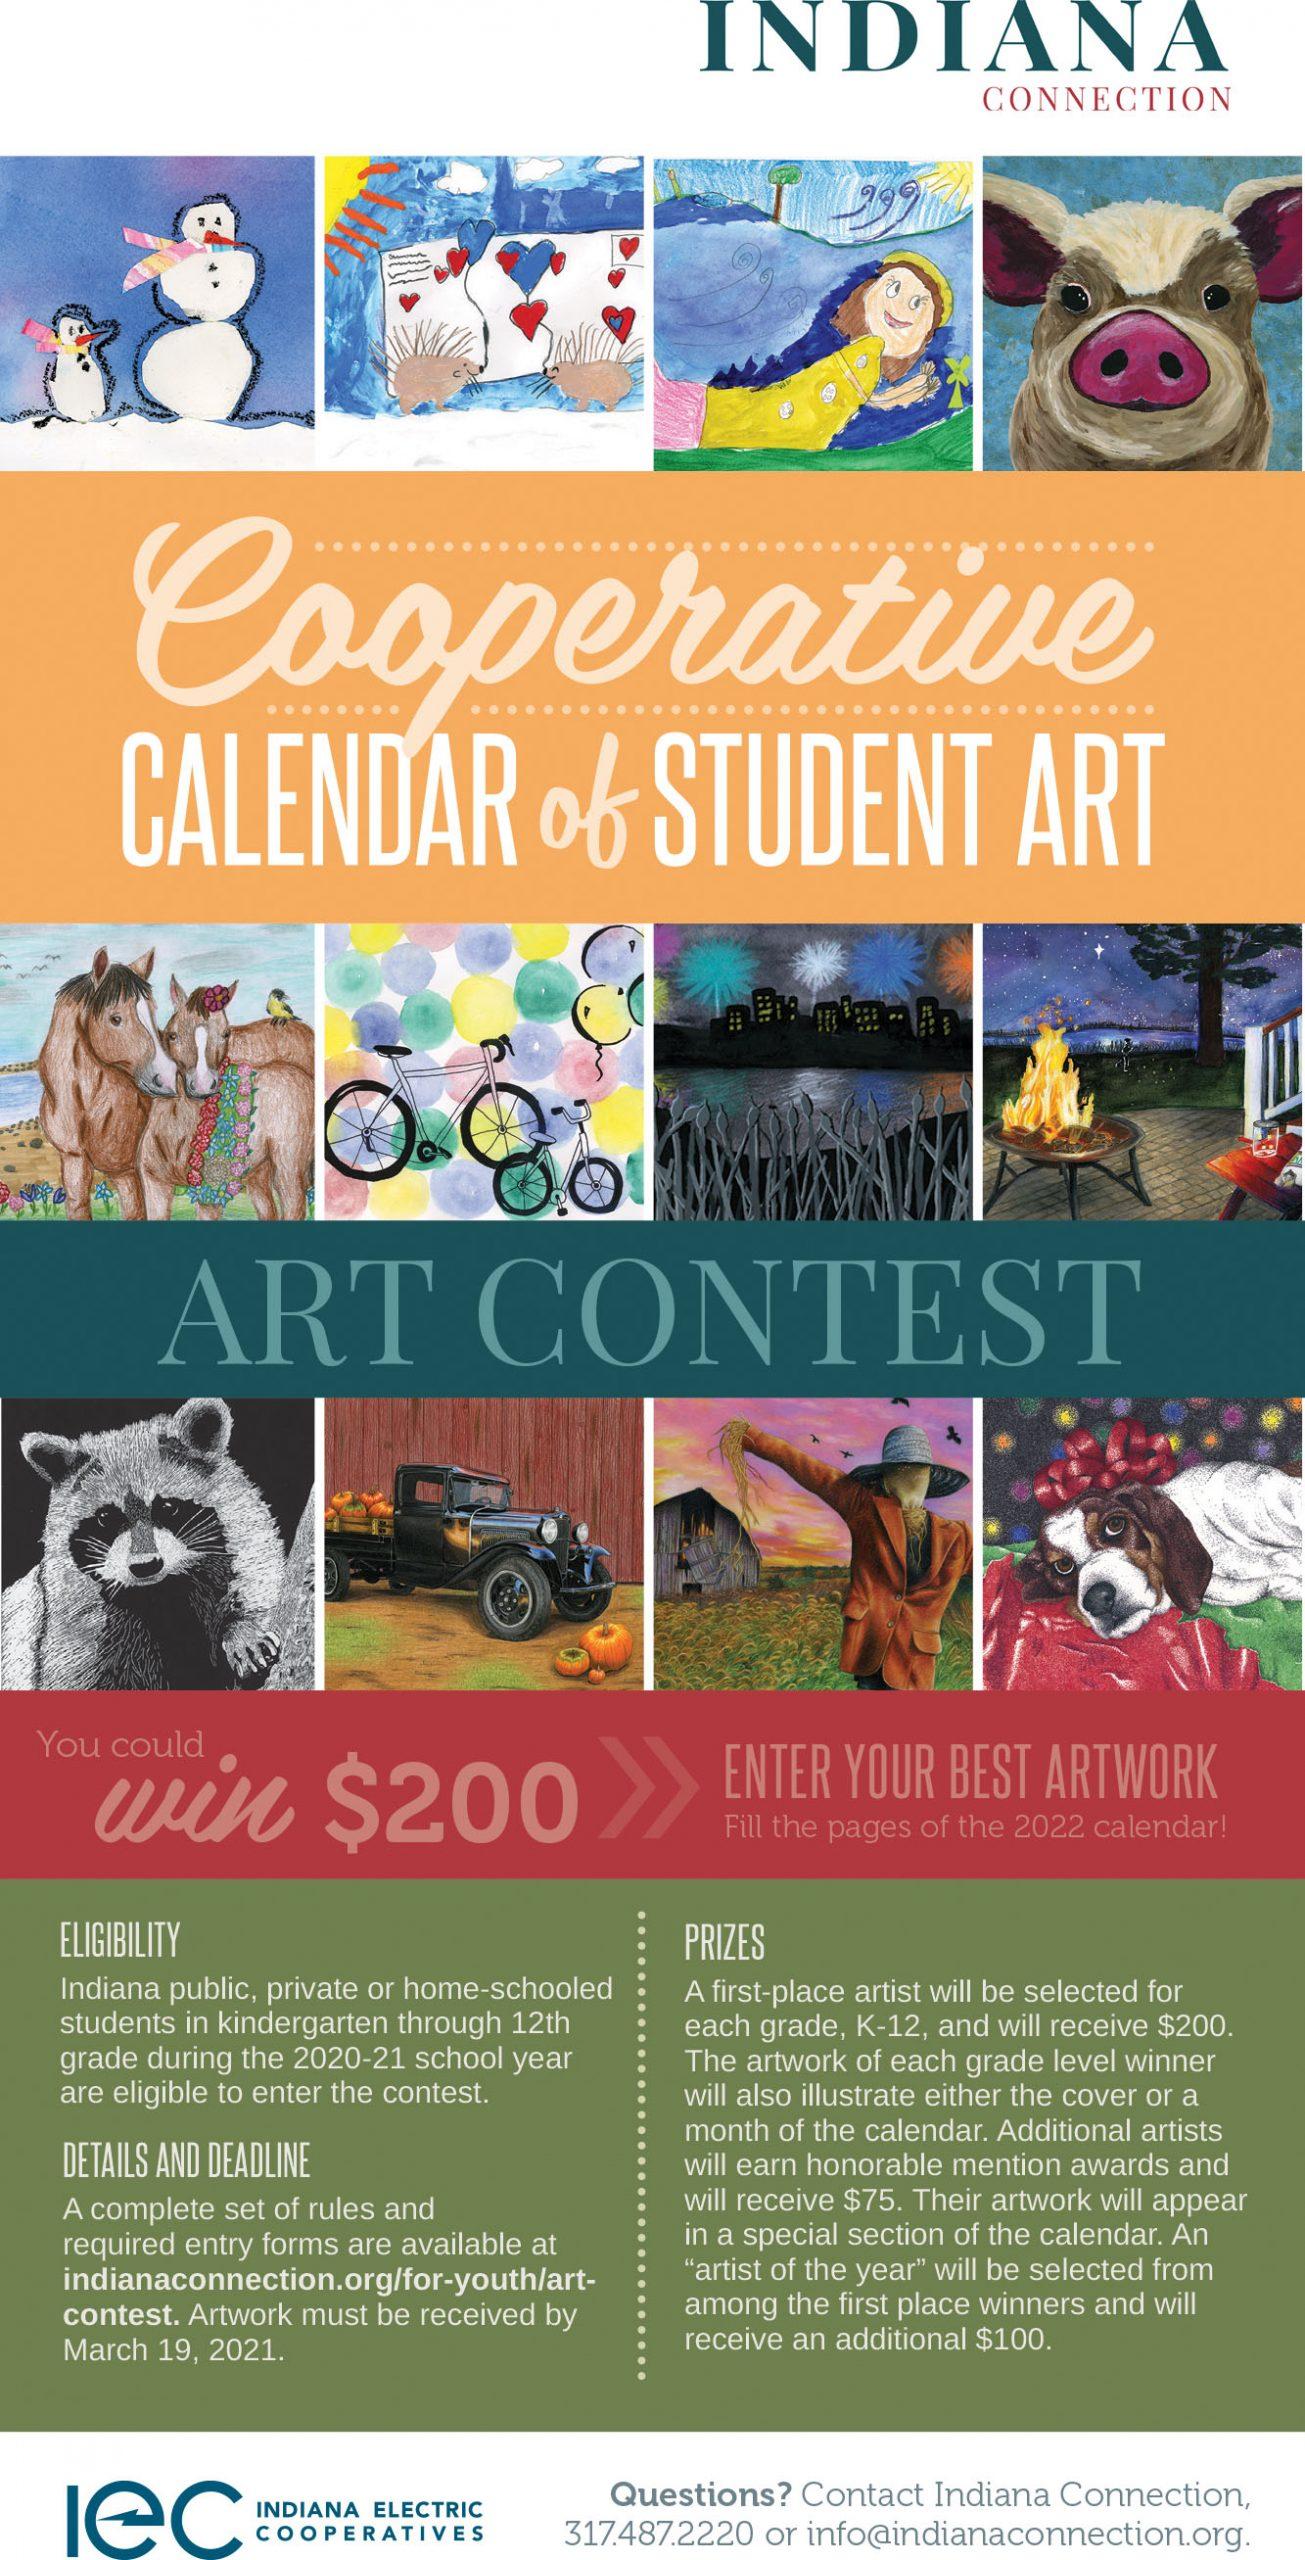 Cooperative Calendar of Student Art Contest ad